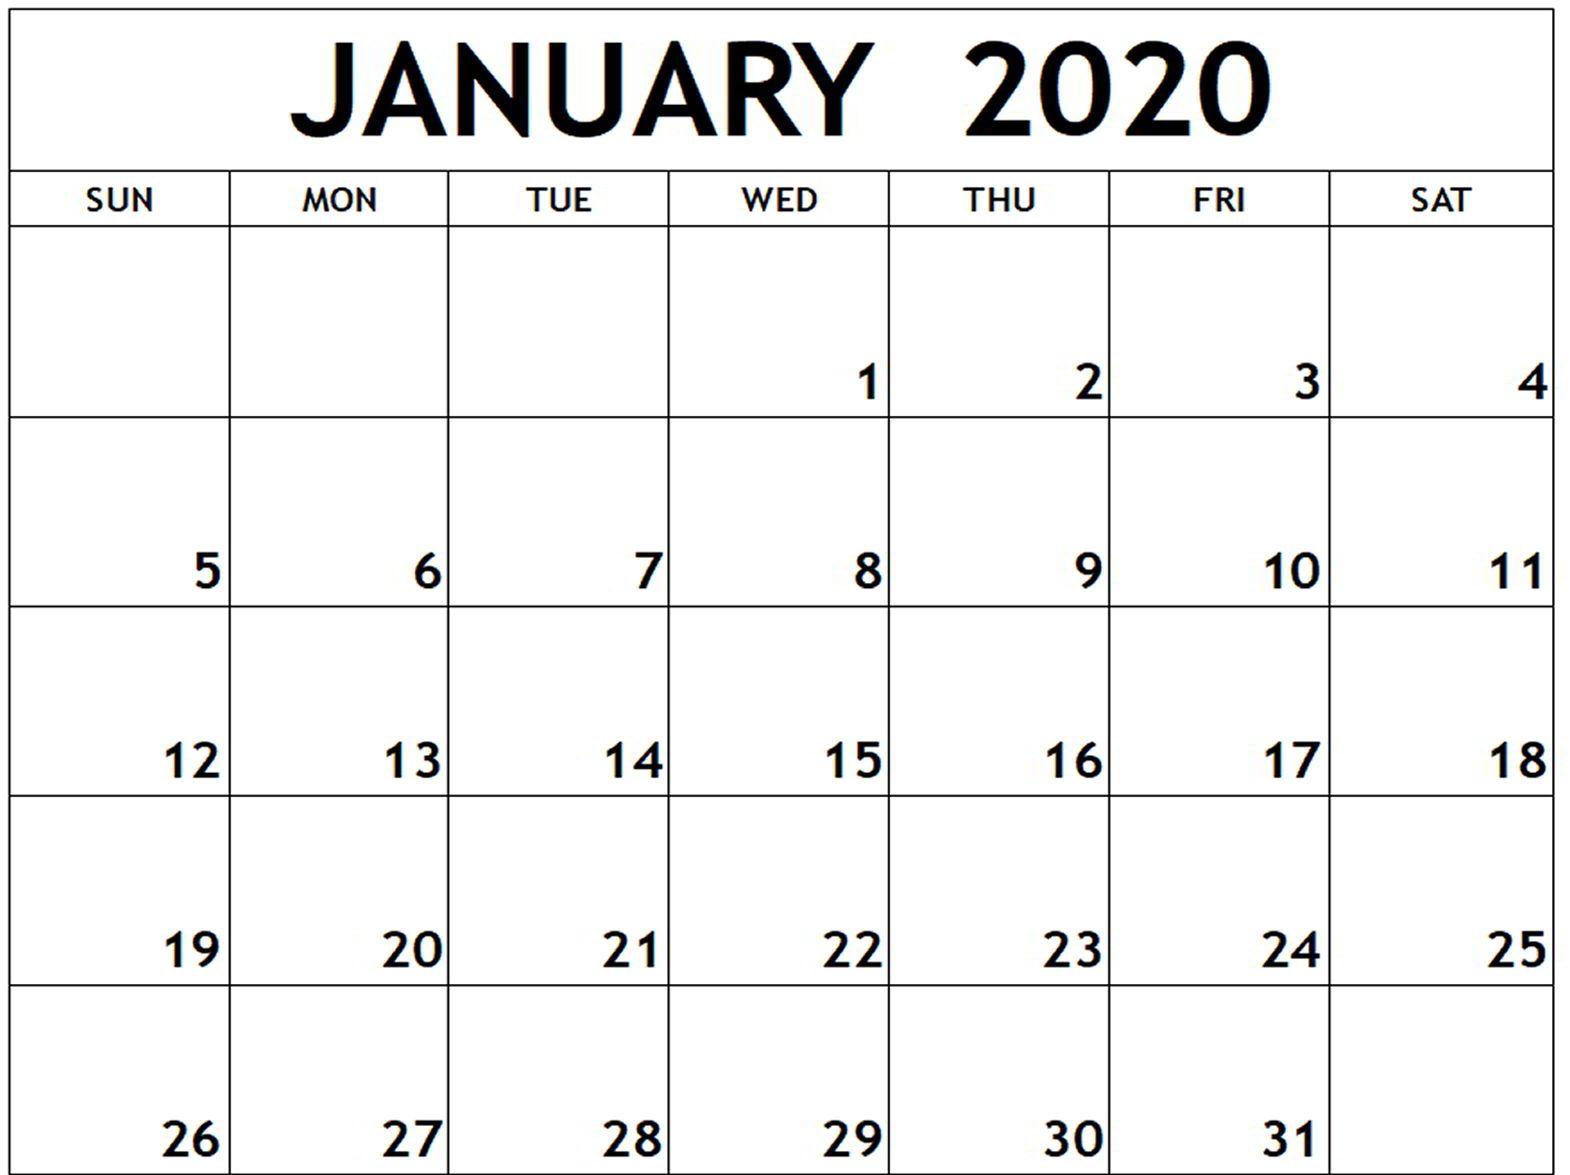 January 2020 Calendar PDF